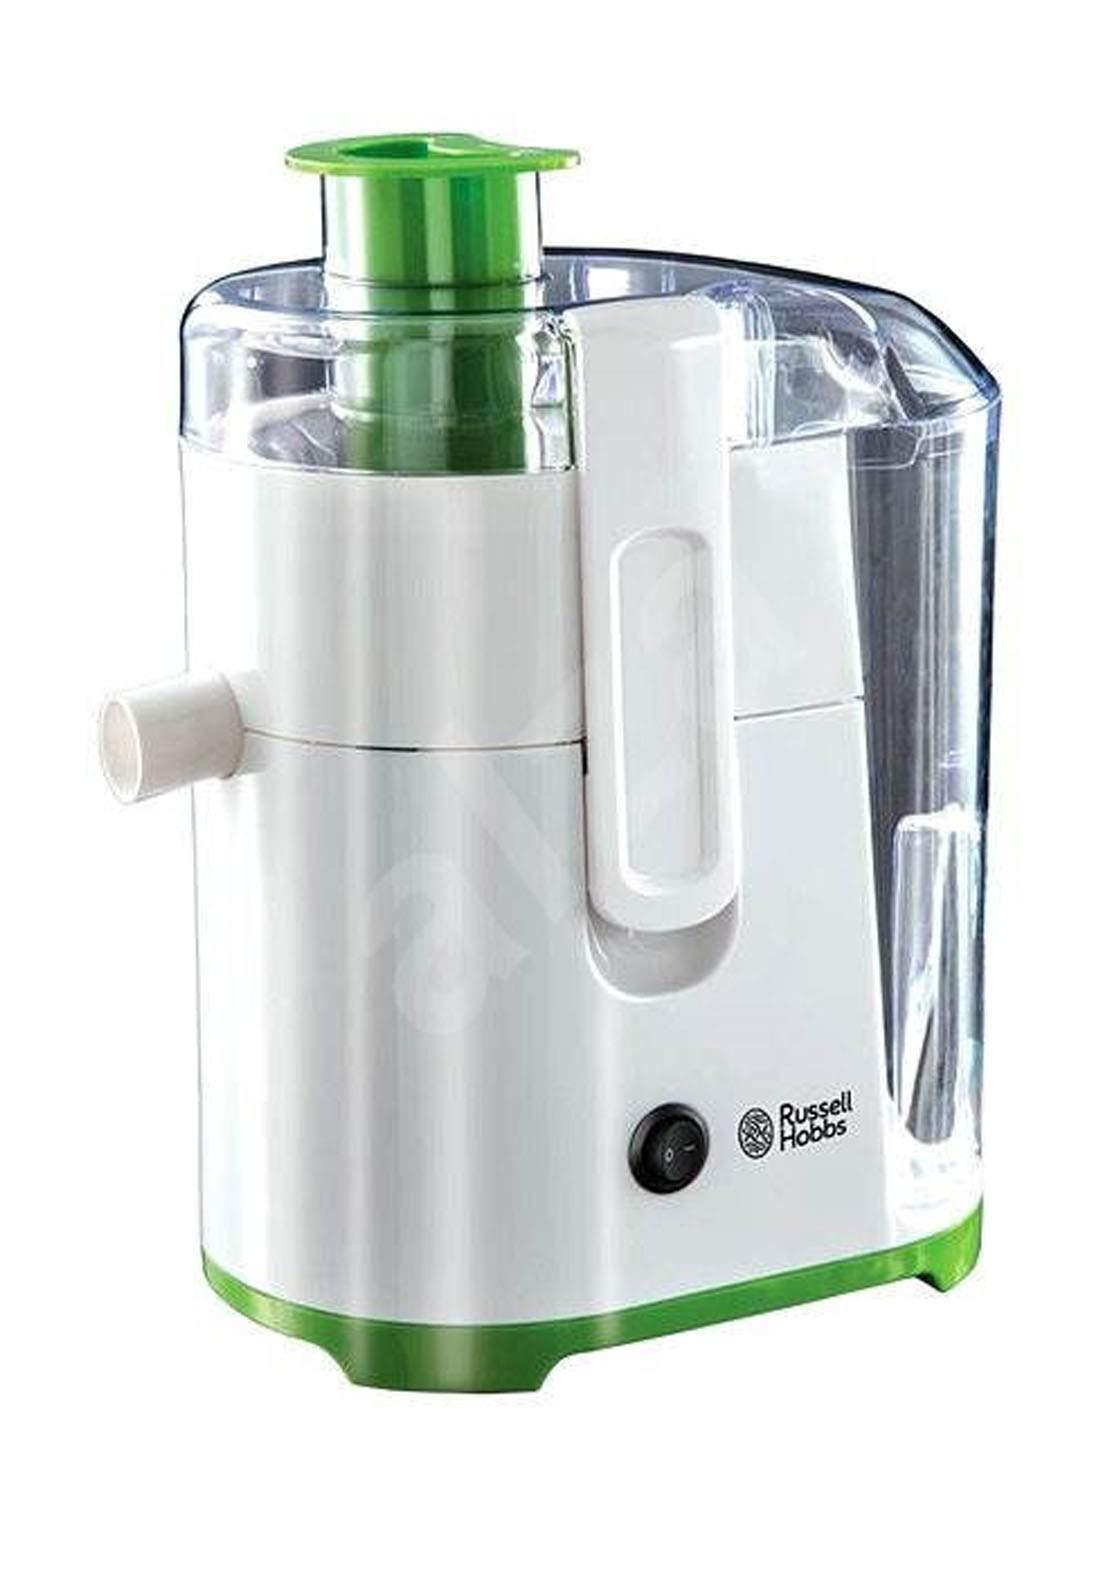 Russell hobbs 22880  Fruit juicer عصارة فواكه